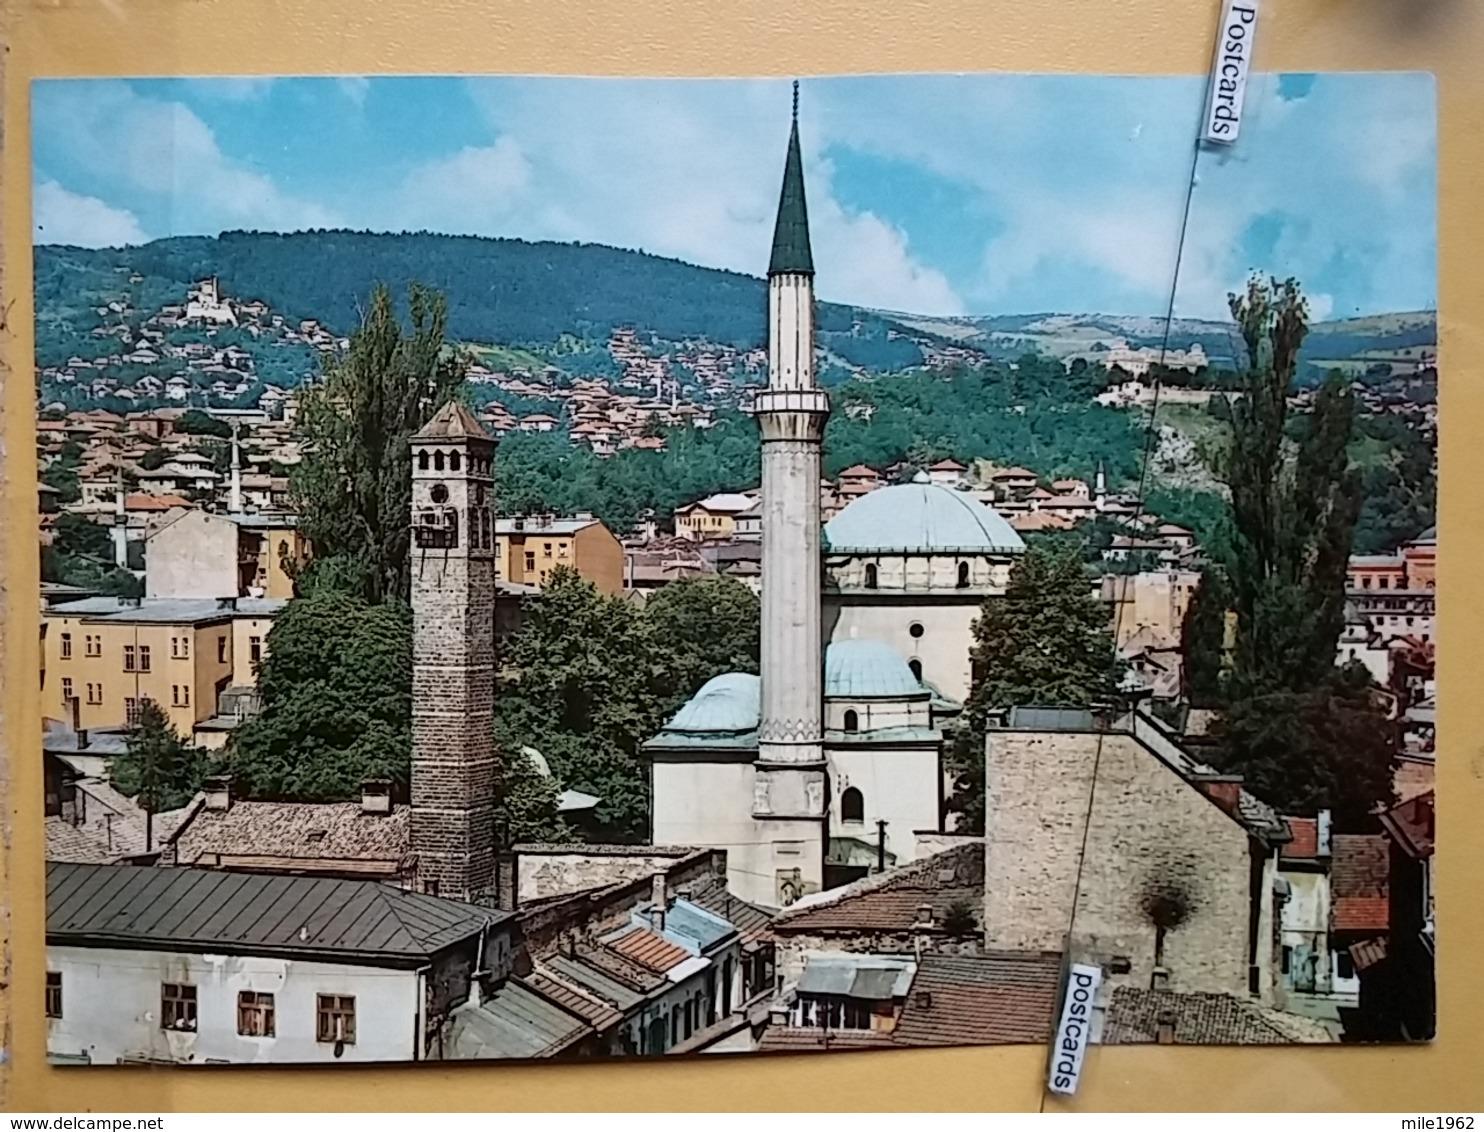 KOV 303-7 -  SARAJEVO, BOSNIA AND HERZEGOVINA, MOSQUE, BEGOVA DZAMIJA, - Bosnien-Herzegowina